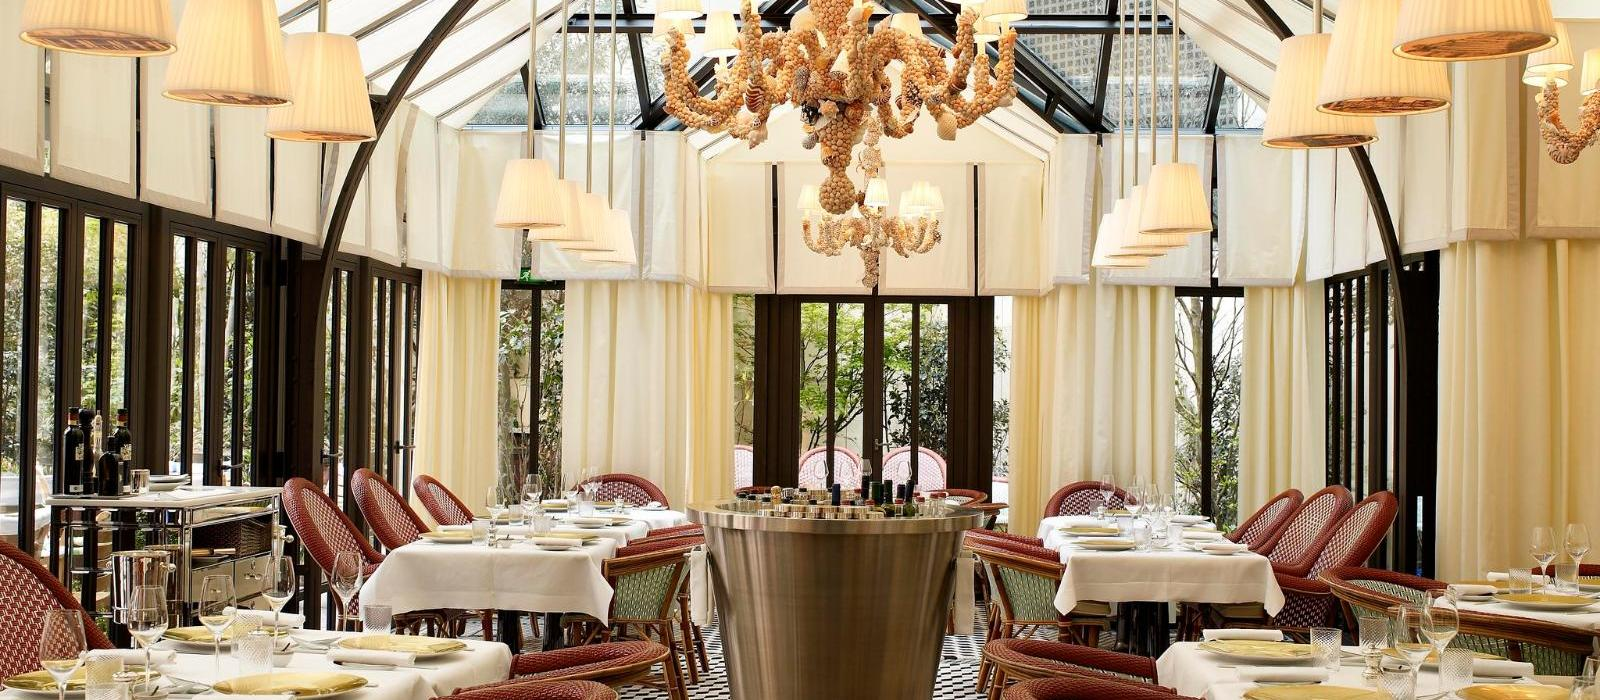 巴黎莱福士皇家梦索酒店(Le Royal Monceau – Raffles Paris) Il Carpaccio餐厅图片  www.lhw.cn